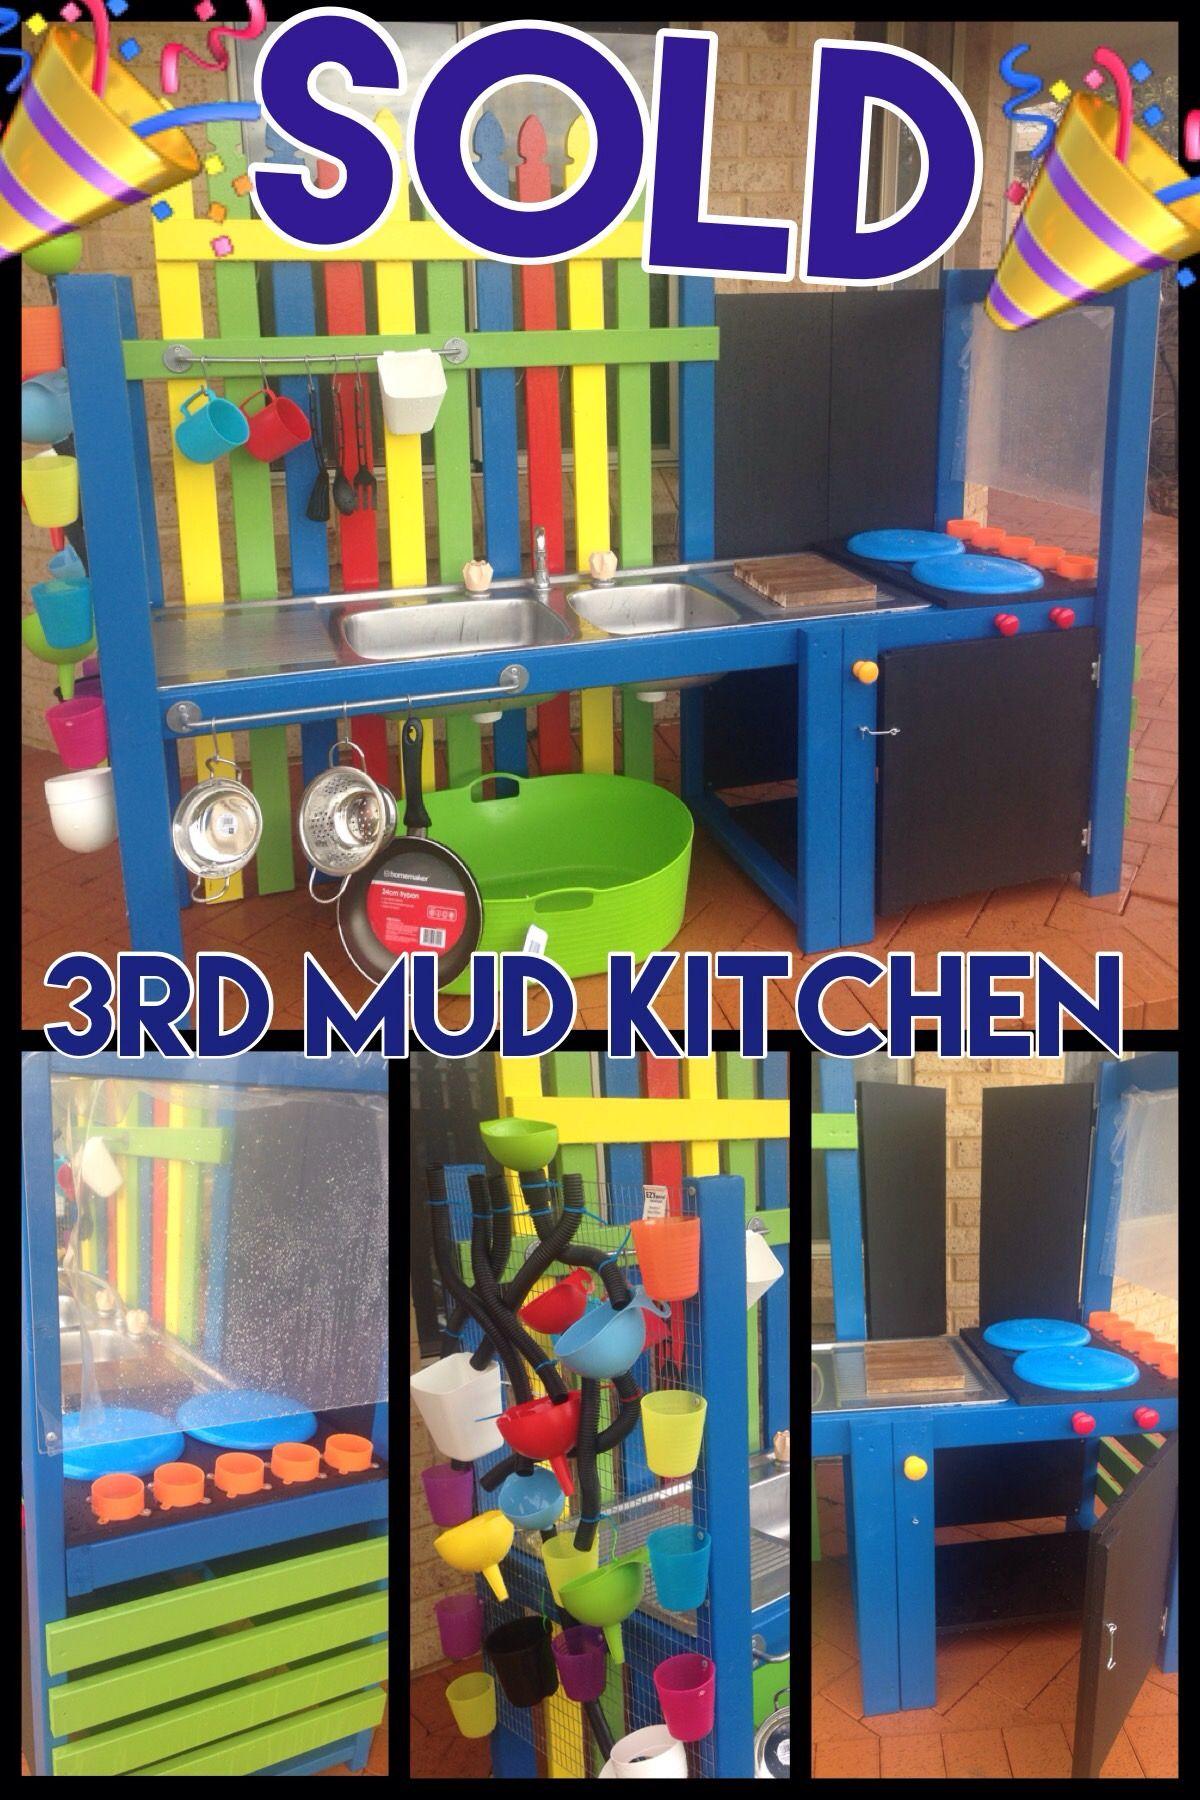 Mud kitchen, Stove,Oven, Shop,Waterwall, Painting easel. Fun Kids outdoor, mud, pretend play Visit my website :-)  https://m.facebook.com/acreativemindaustralia/